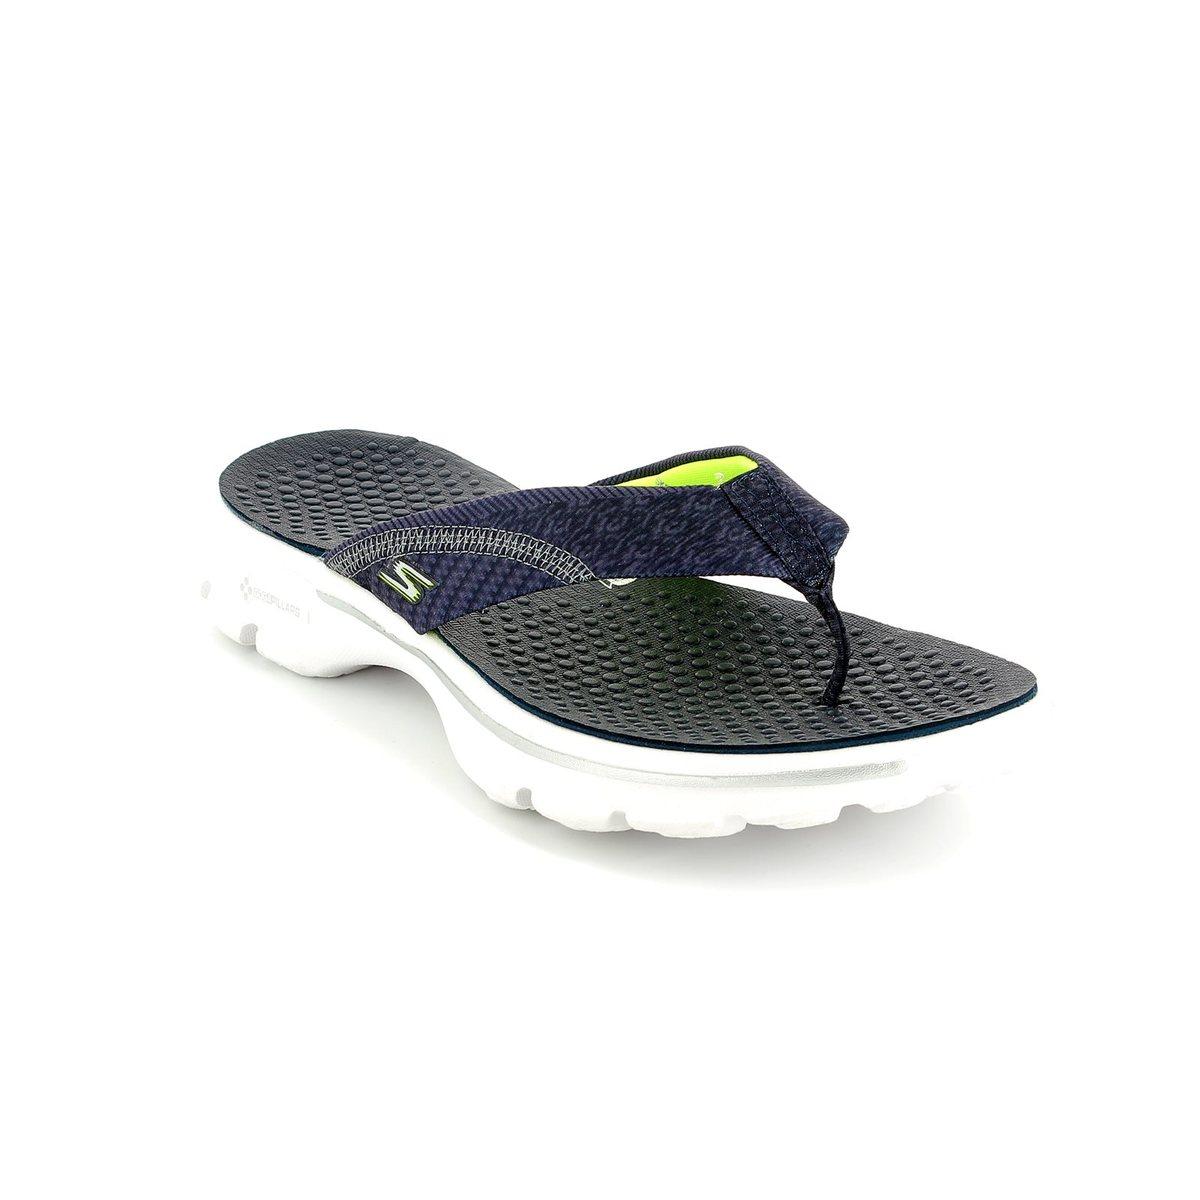 Skechers Shoes For Sale In Australia